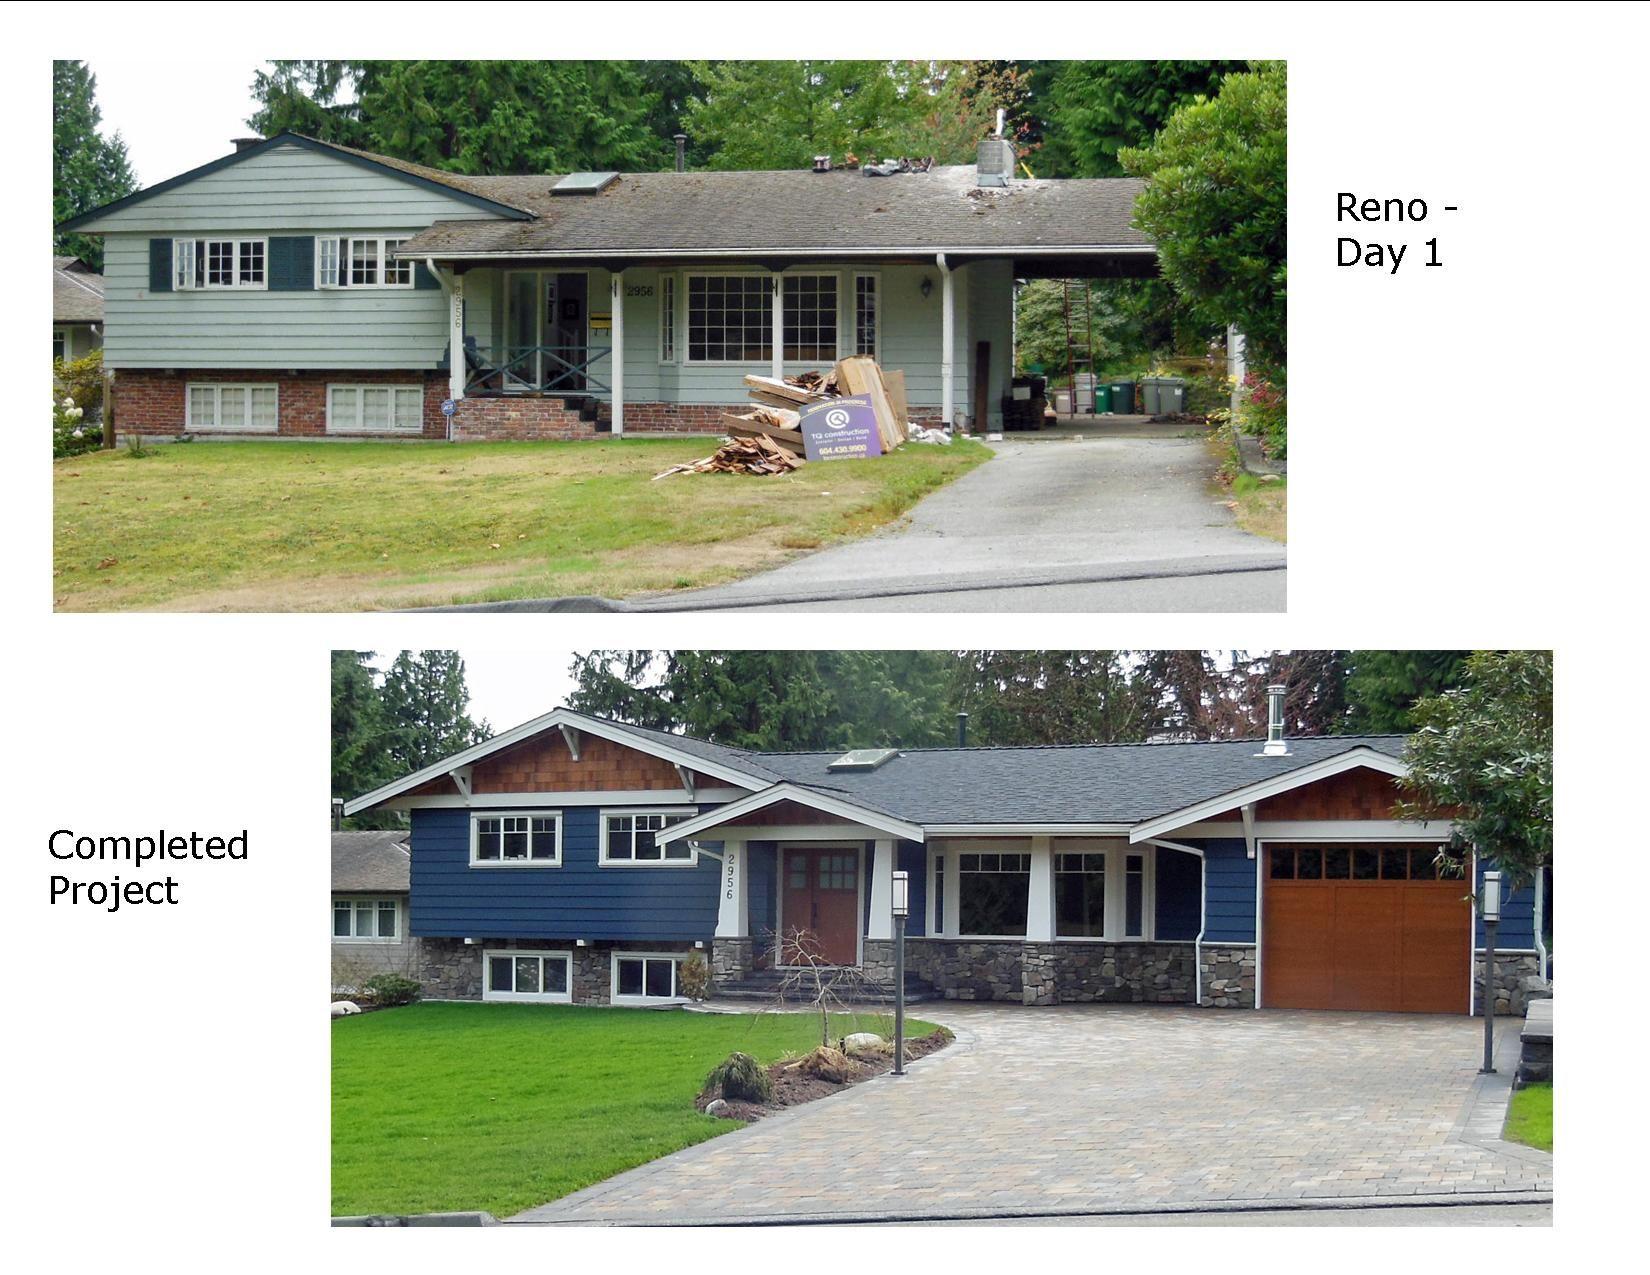 and - renovation